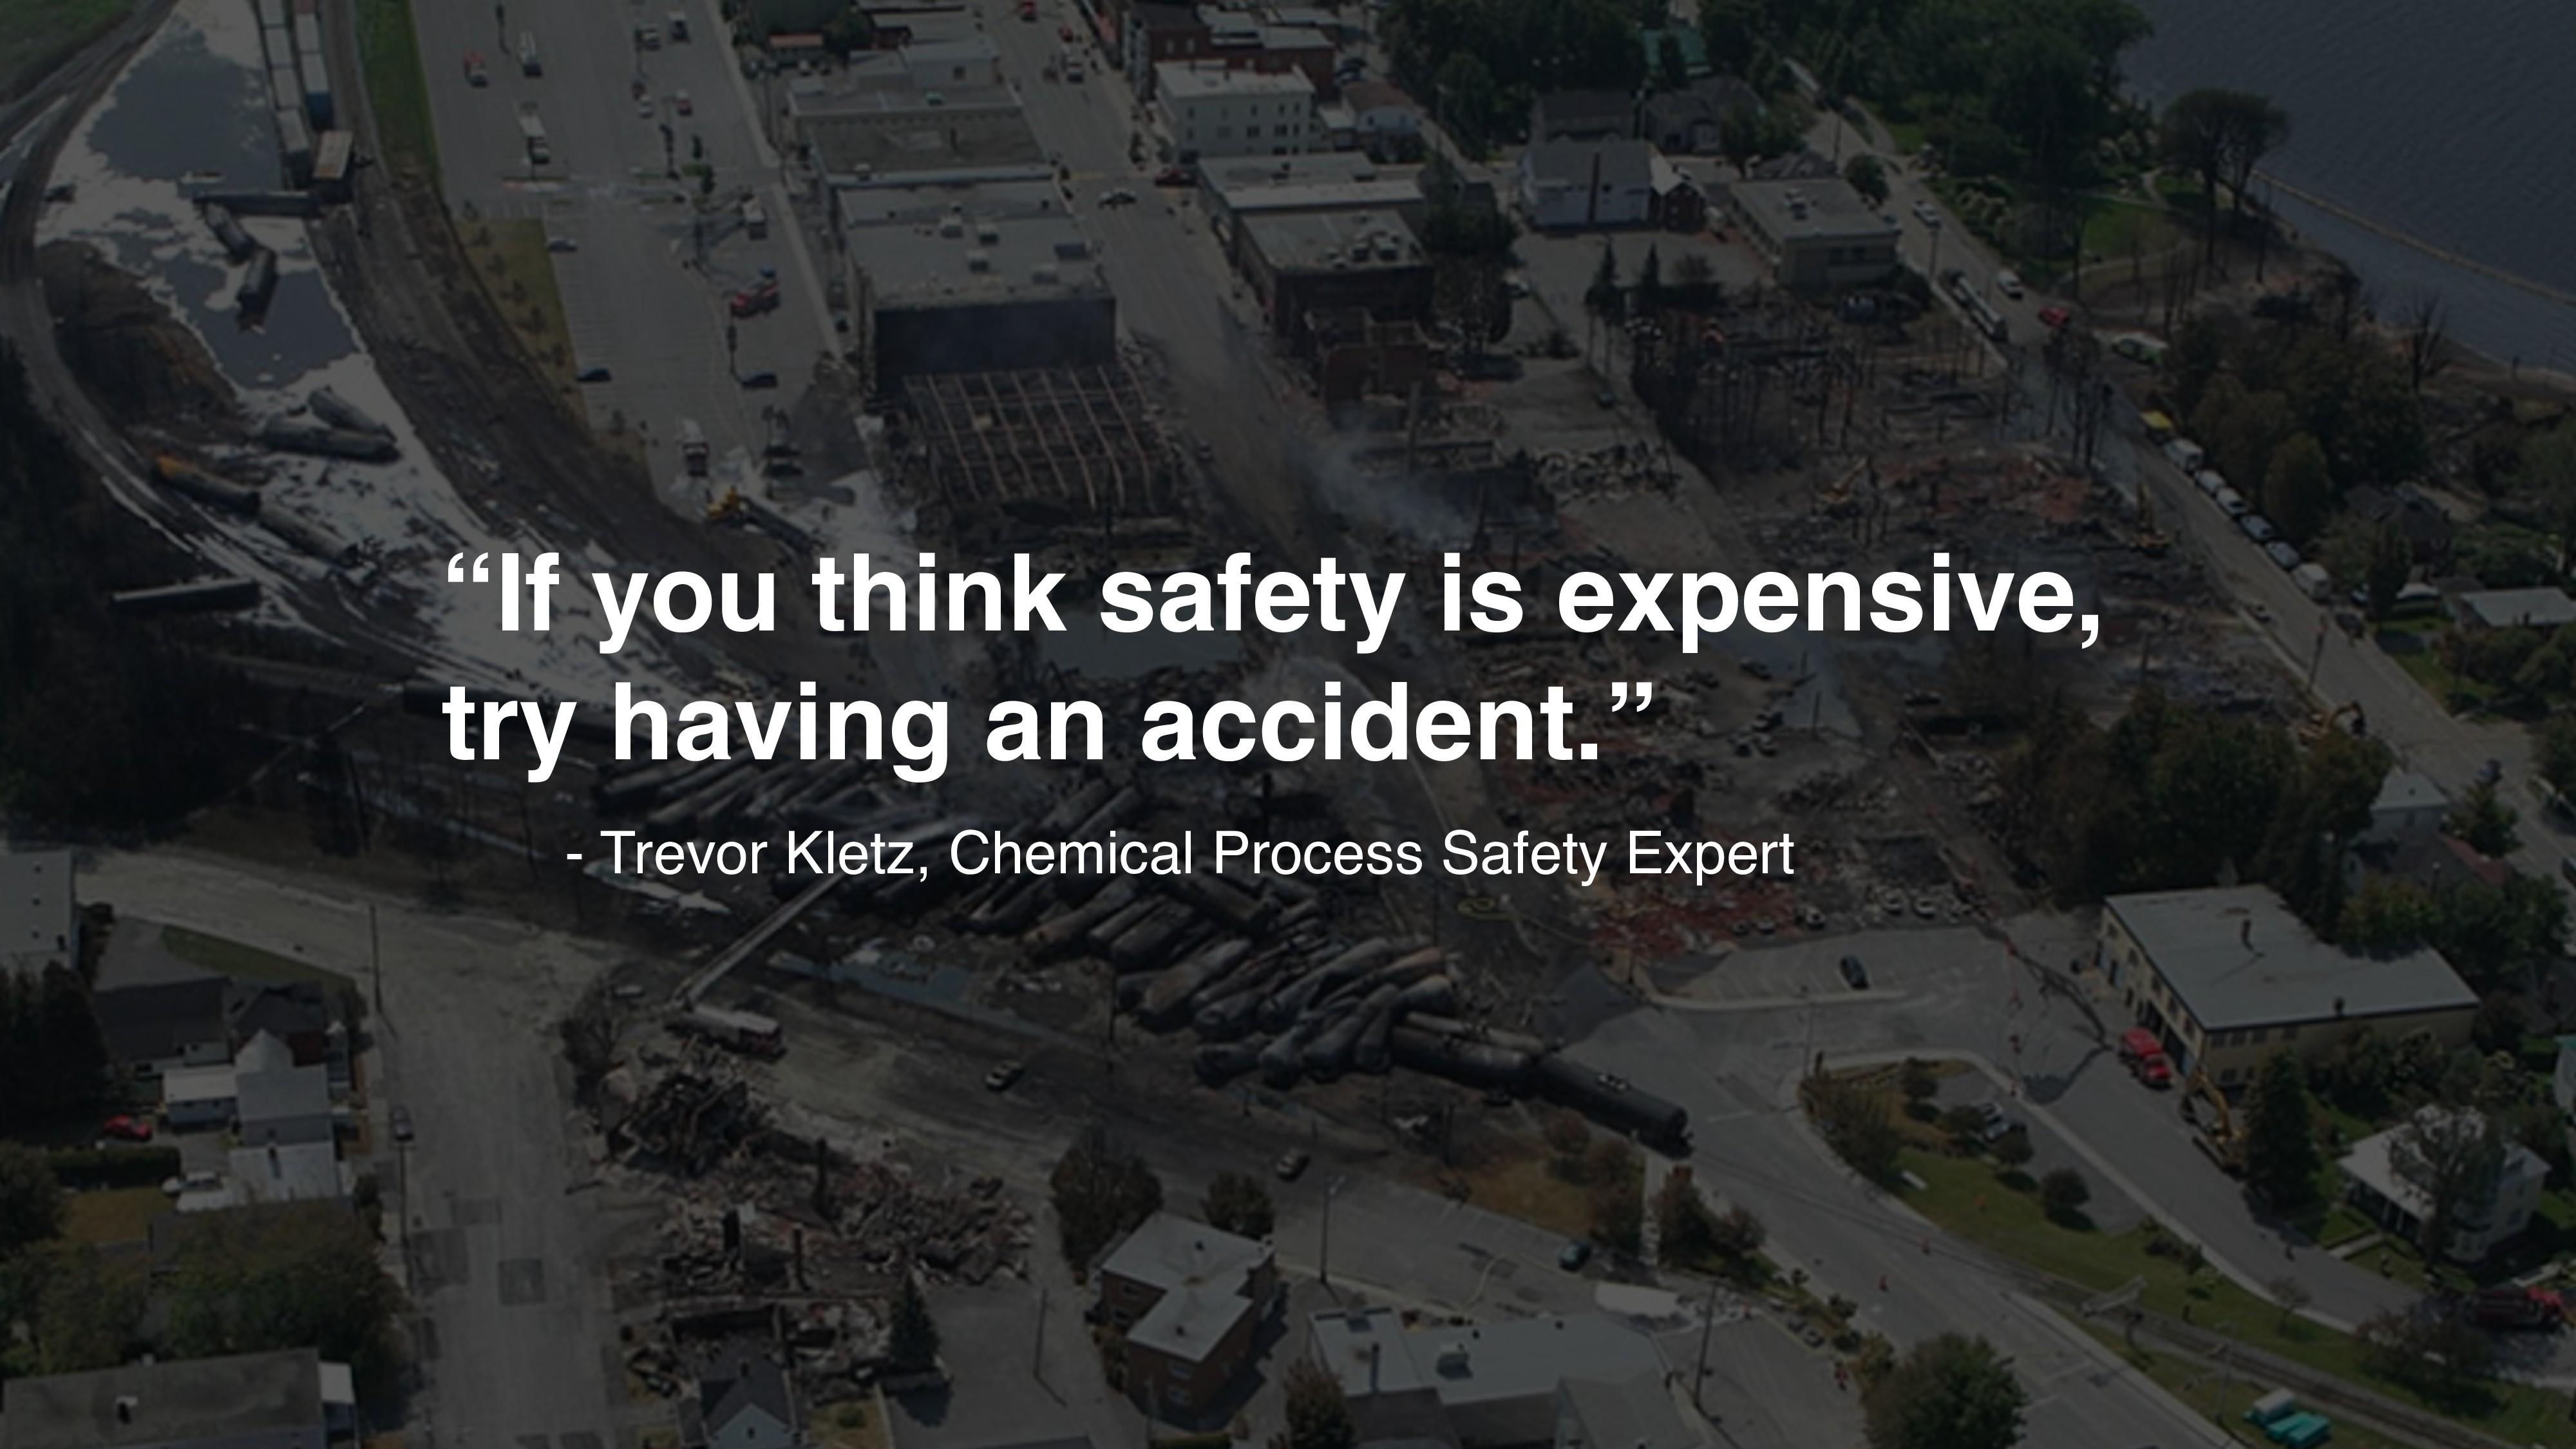 - Trevor Kletz, Chemical Process Safety Expert ...